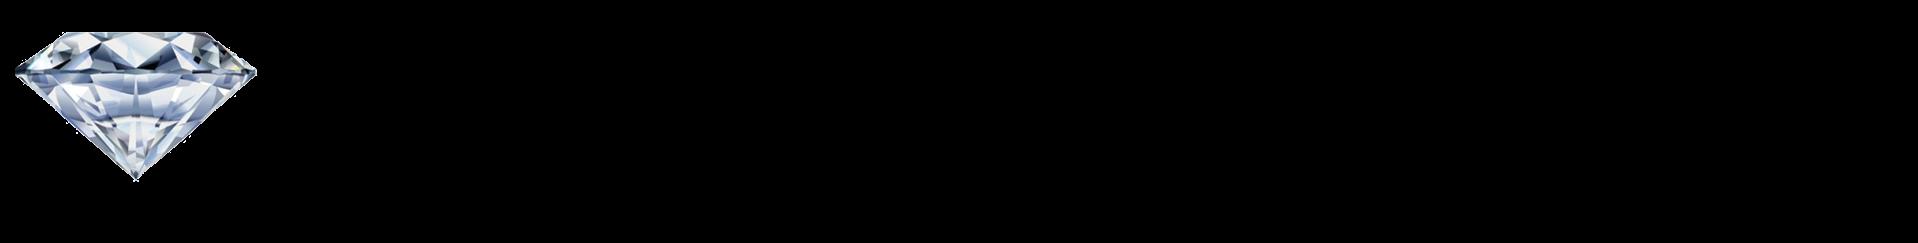 gold   buy   sell   debranf   jewelry   miami   antique   diamond   metal   gemstones   coins   silver   used   cash   business   gia   certified   logo   compra   de   oro   miami f  lorida   chatarra   scrap   gems   silver   plata   diamantes   gemas   broken   antiques   sterling   silver   watche  s   candleholders   emeralds   aquamarine   teapots   dishes   pocket   watch